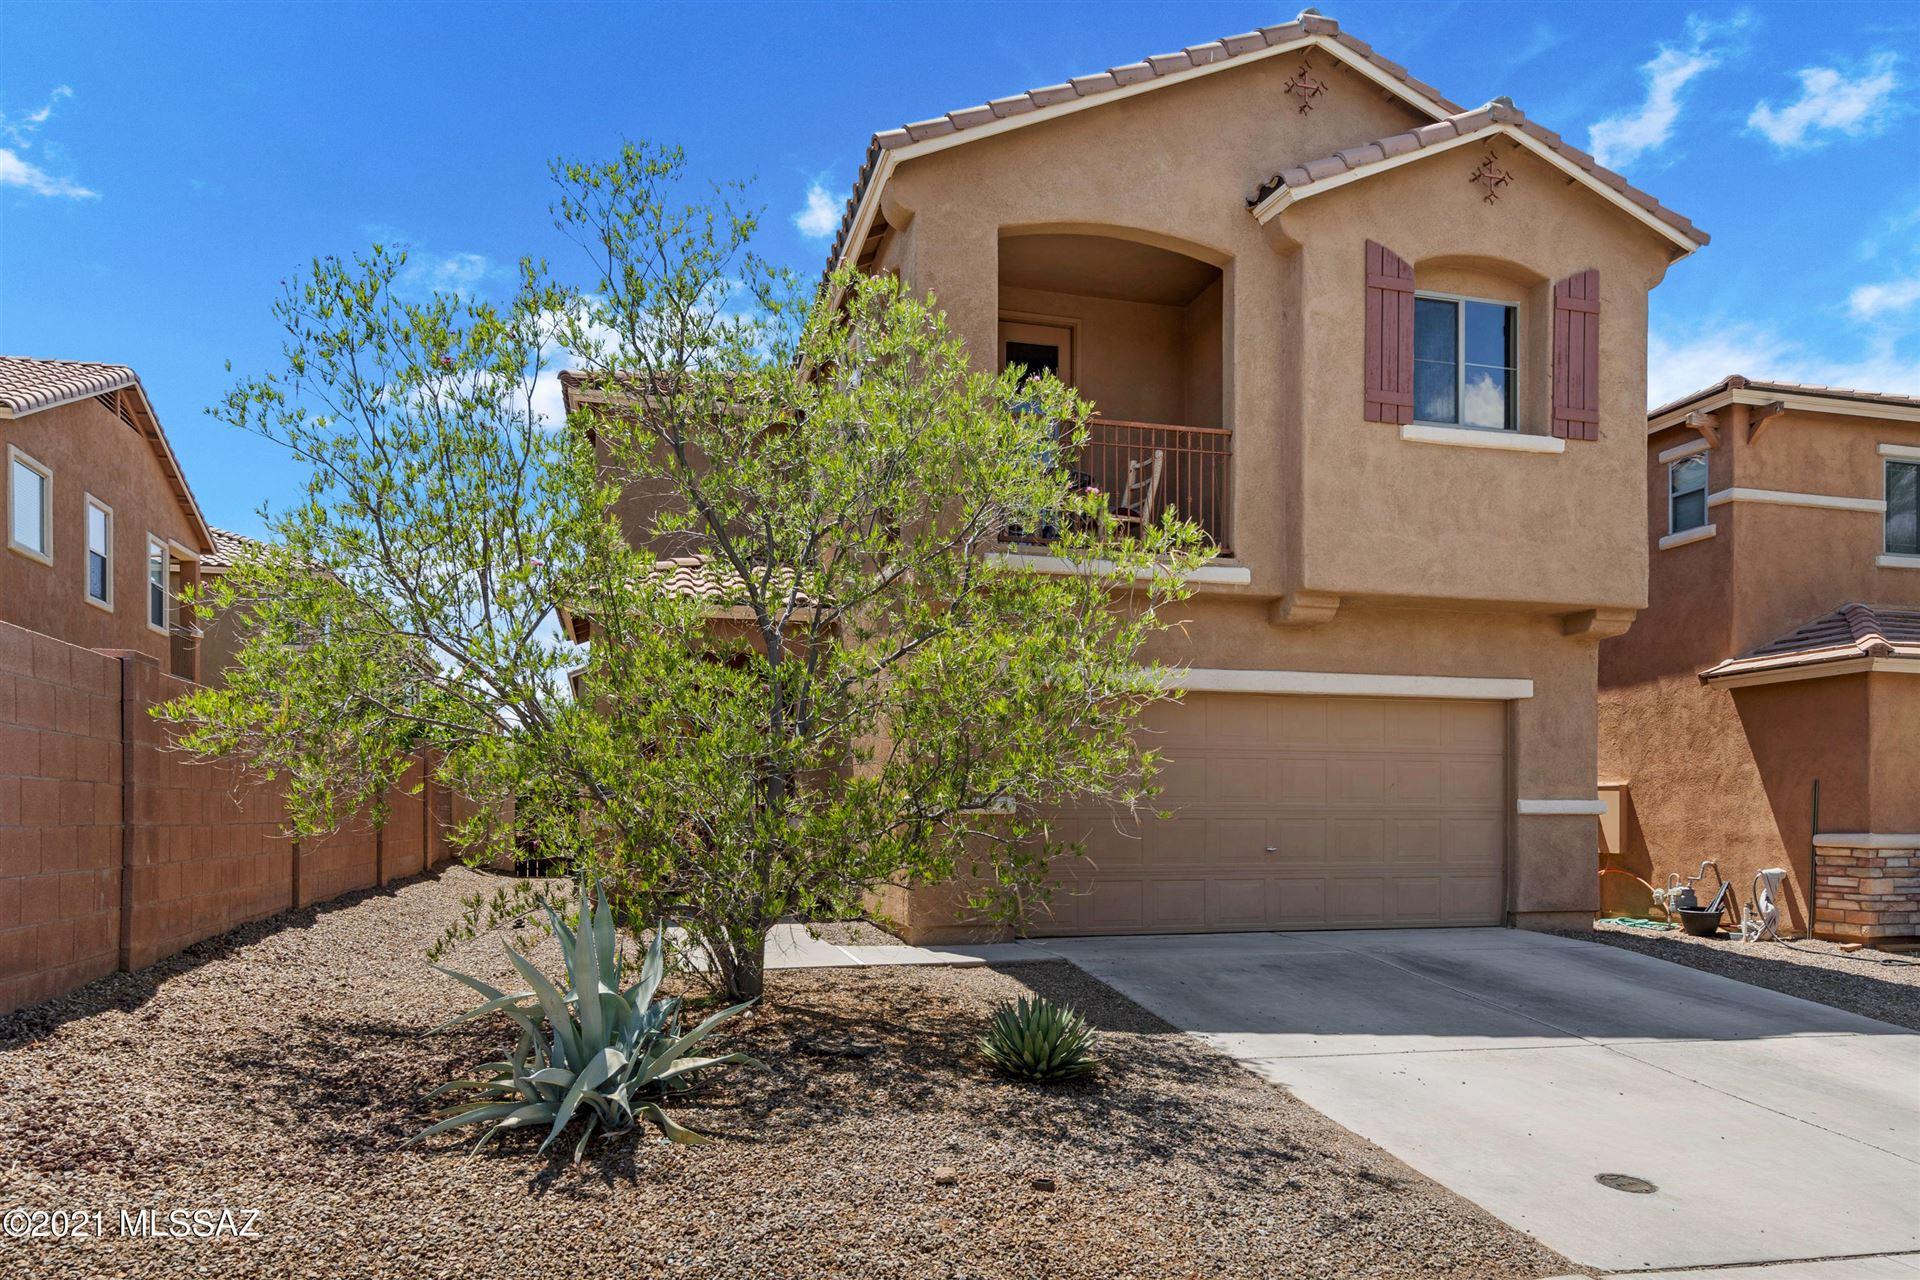 13882 S Camino Nudo, Sahuarita, AZ 85629 - MLS#: 22116729